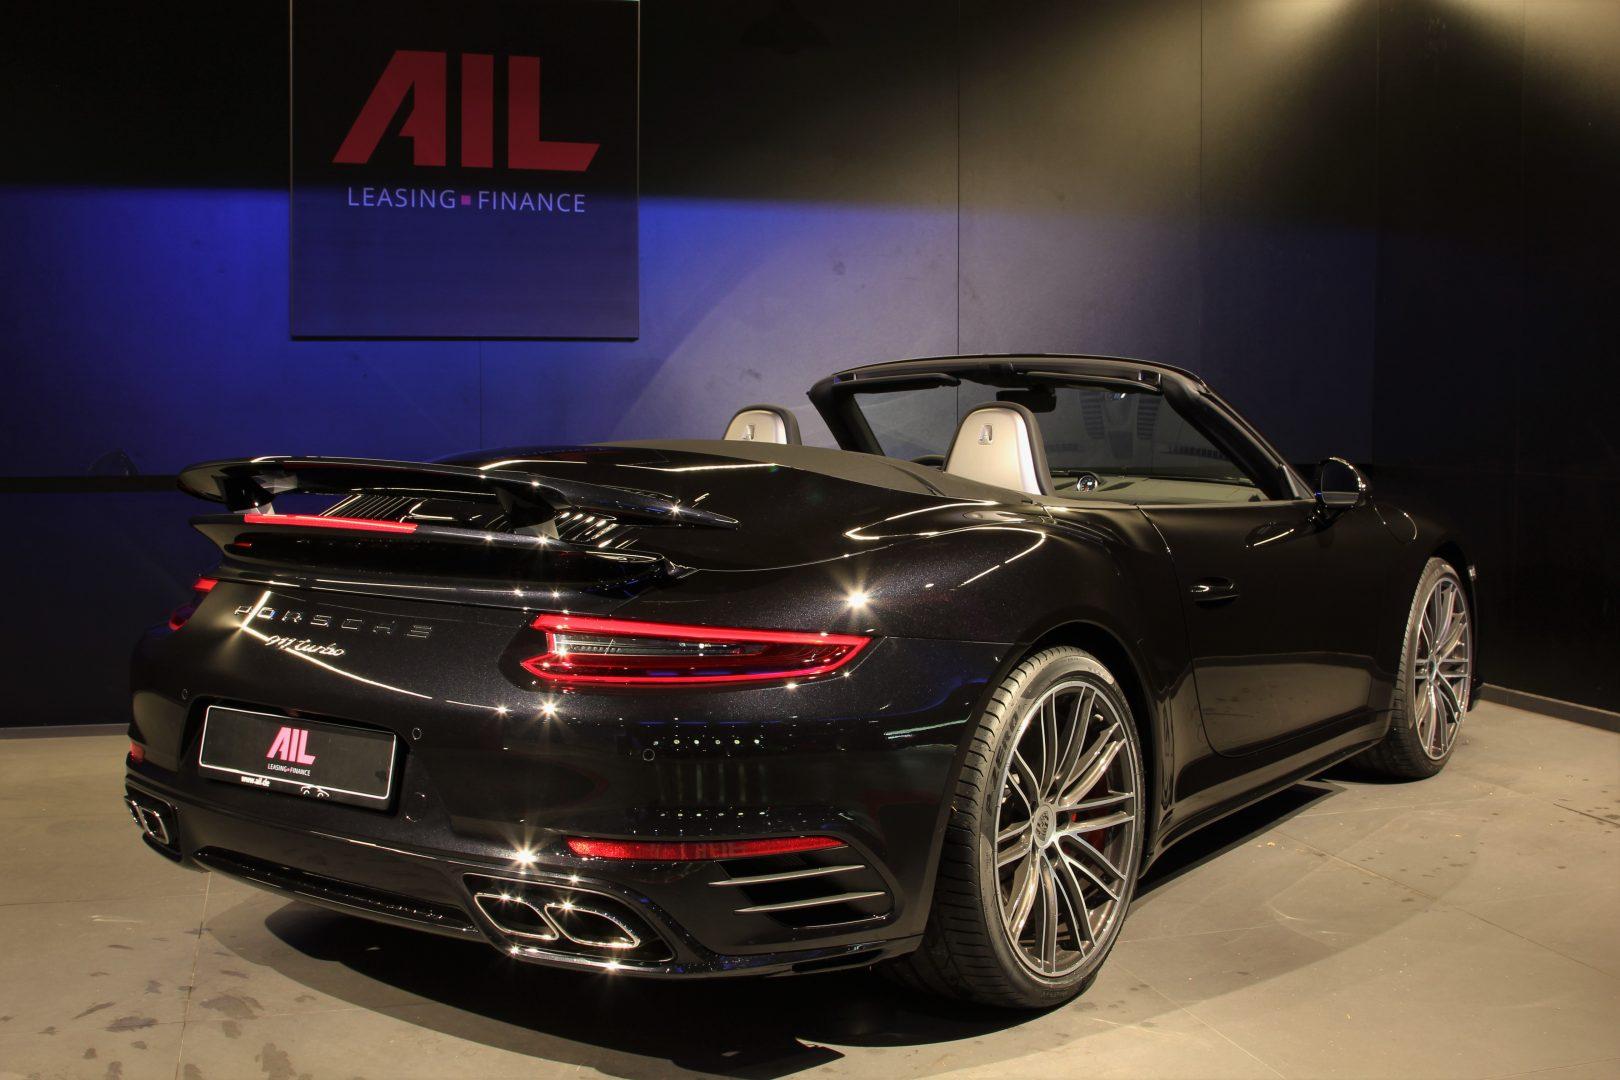 AIL Porsche 991 Turbo Lift LED DAB 1